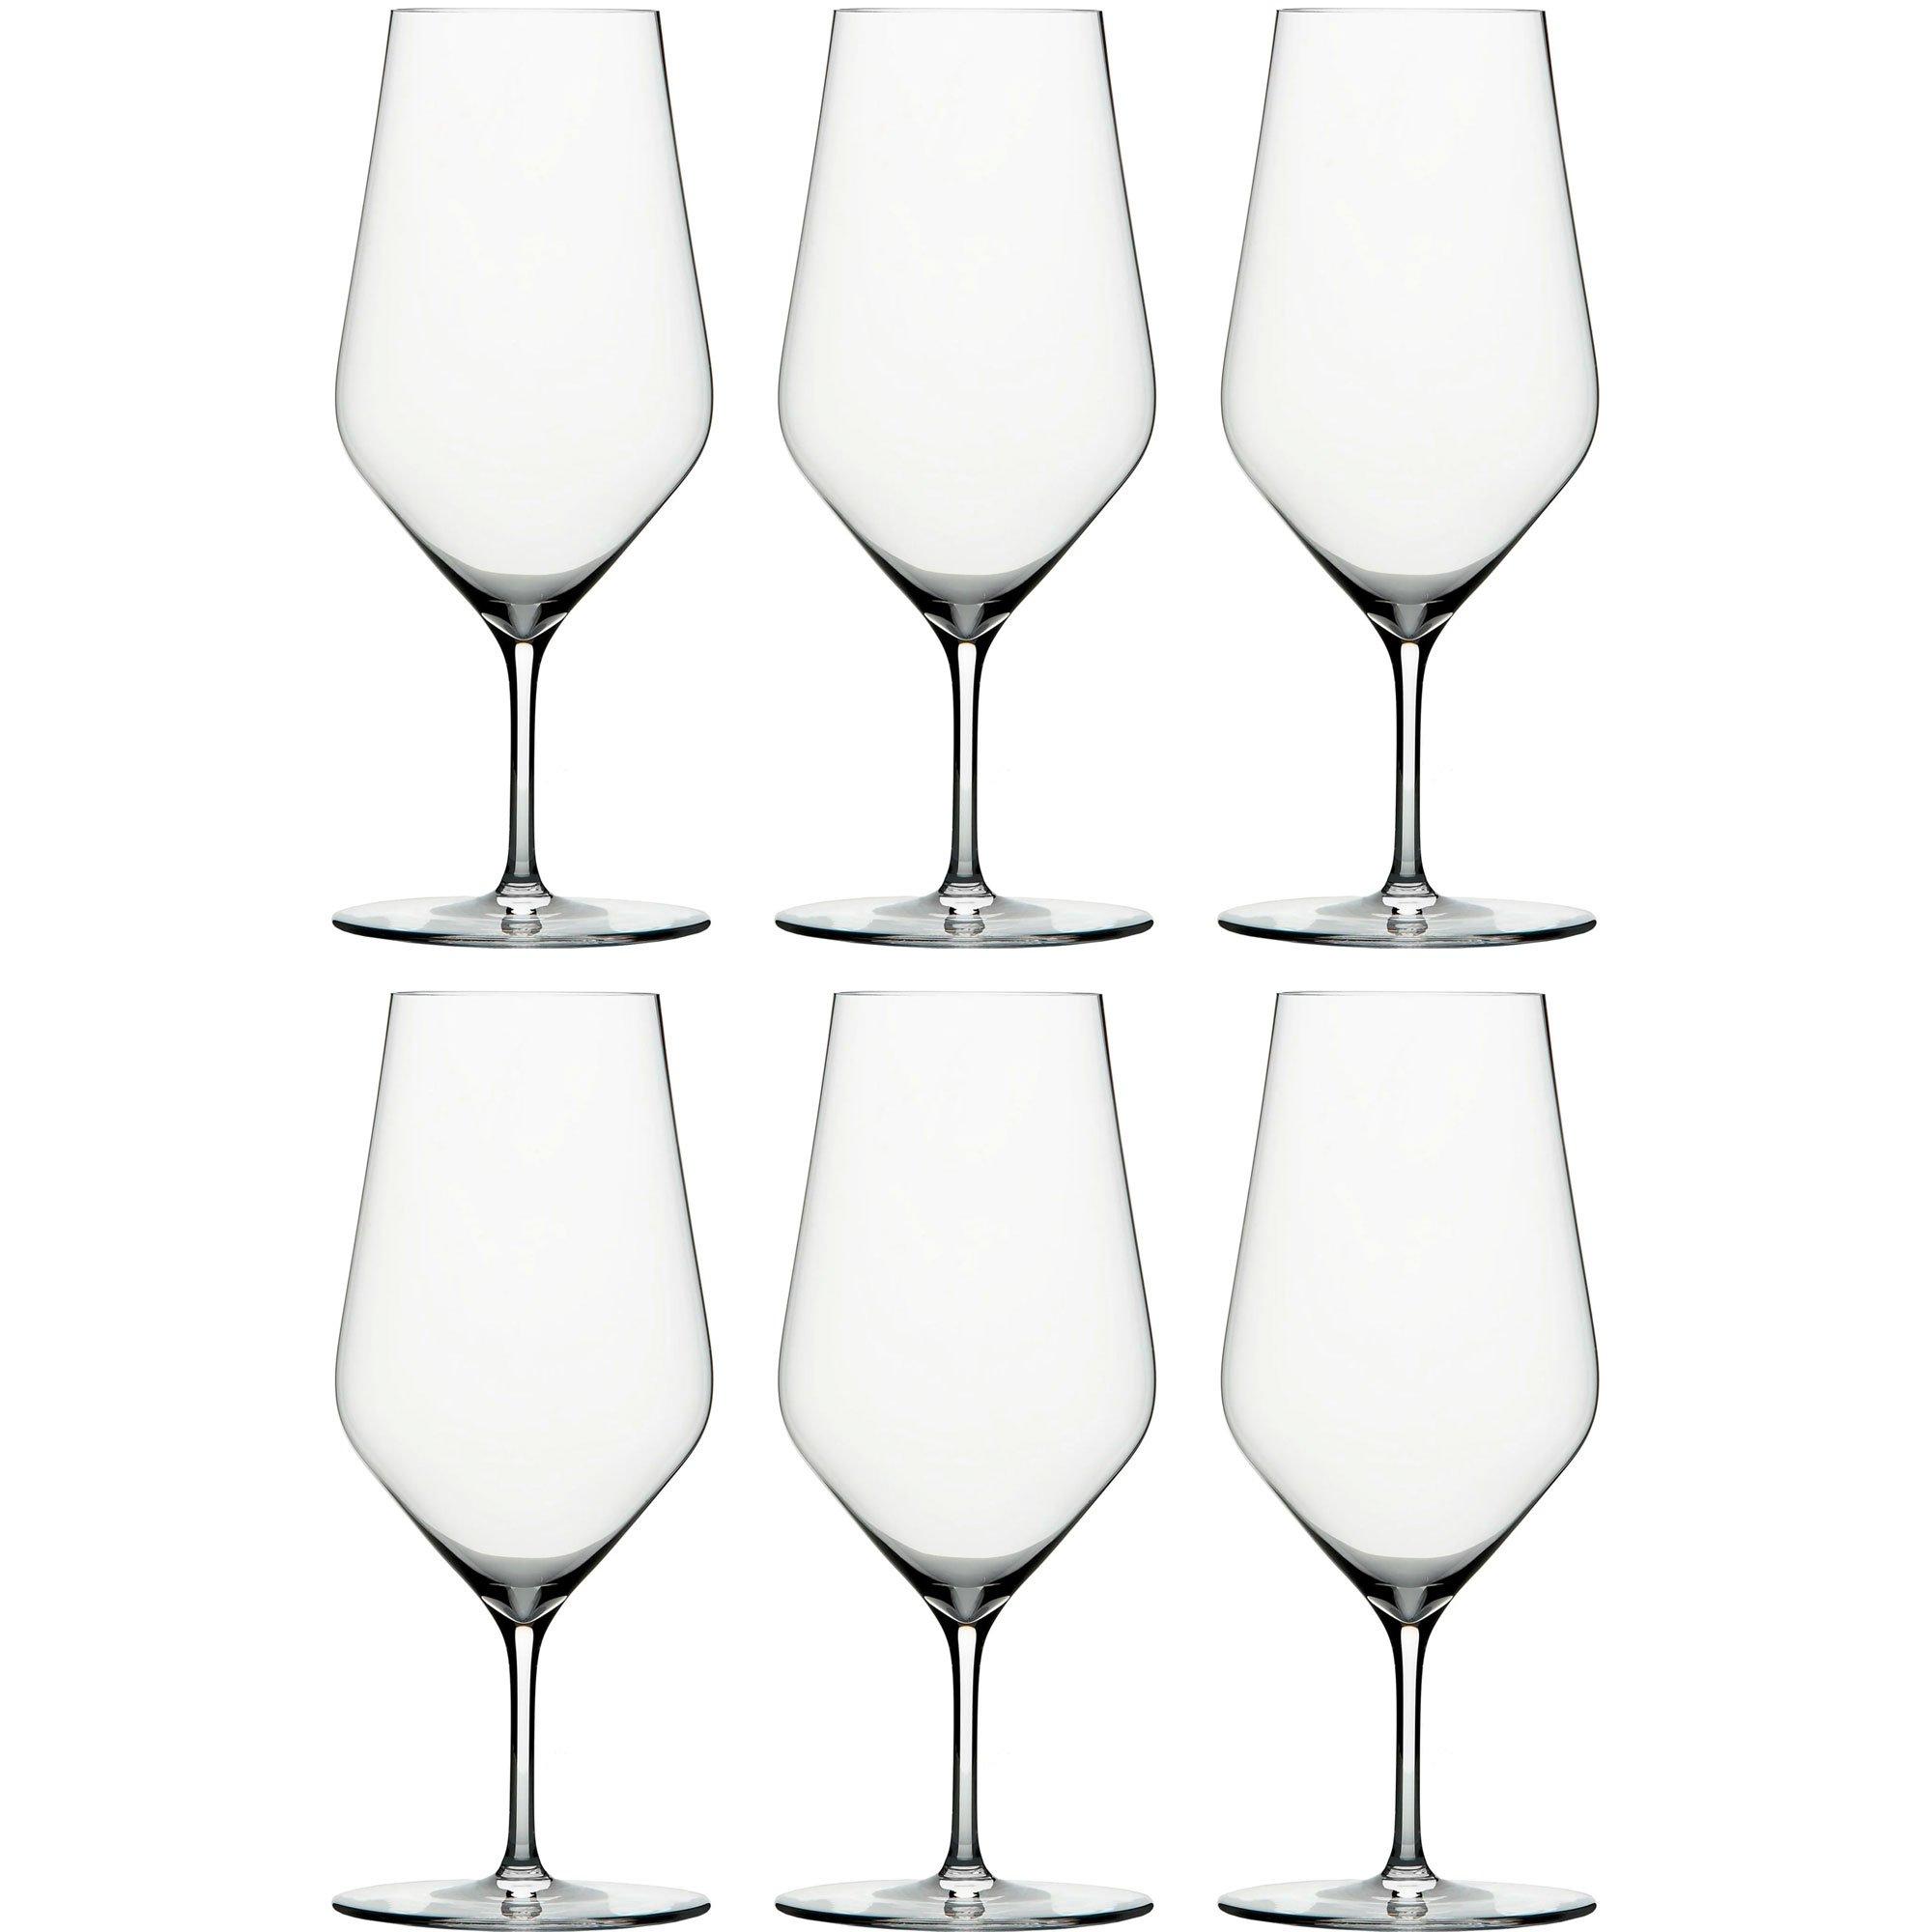 Zalto Vattenglas 400 ml. 6 st.